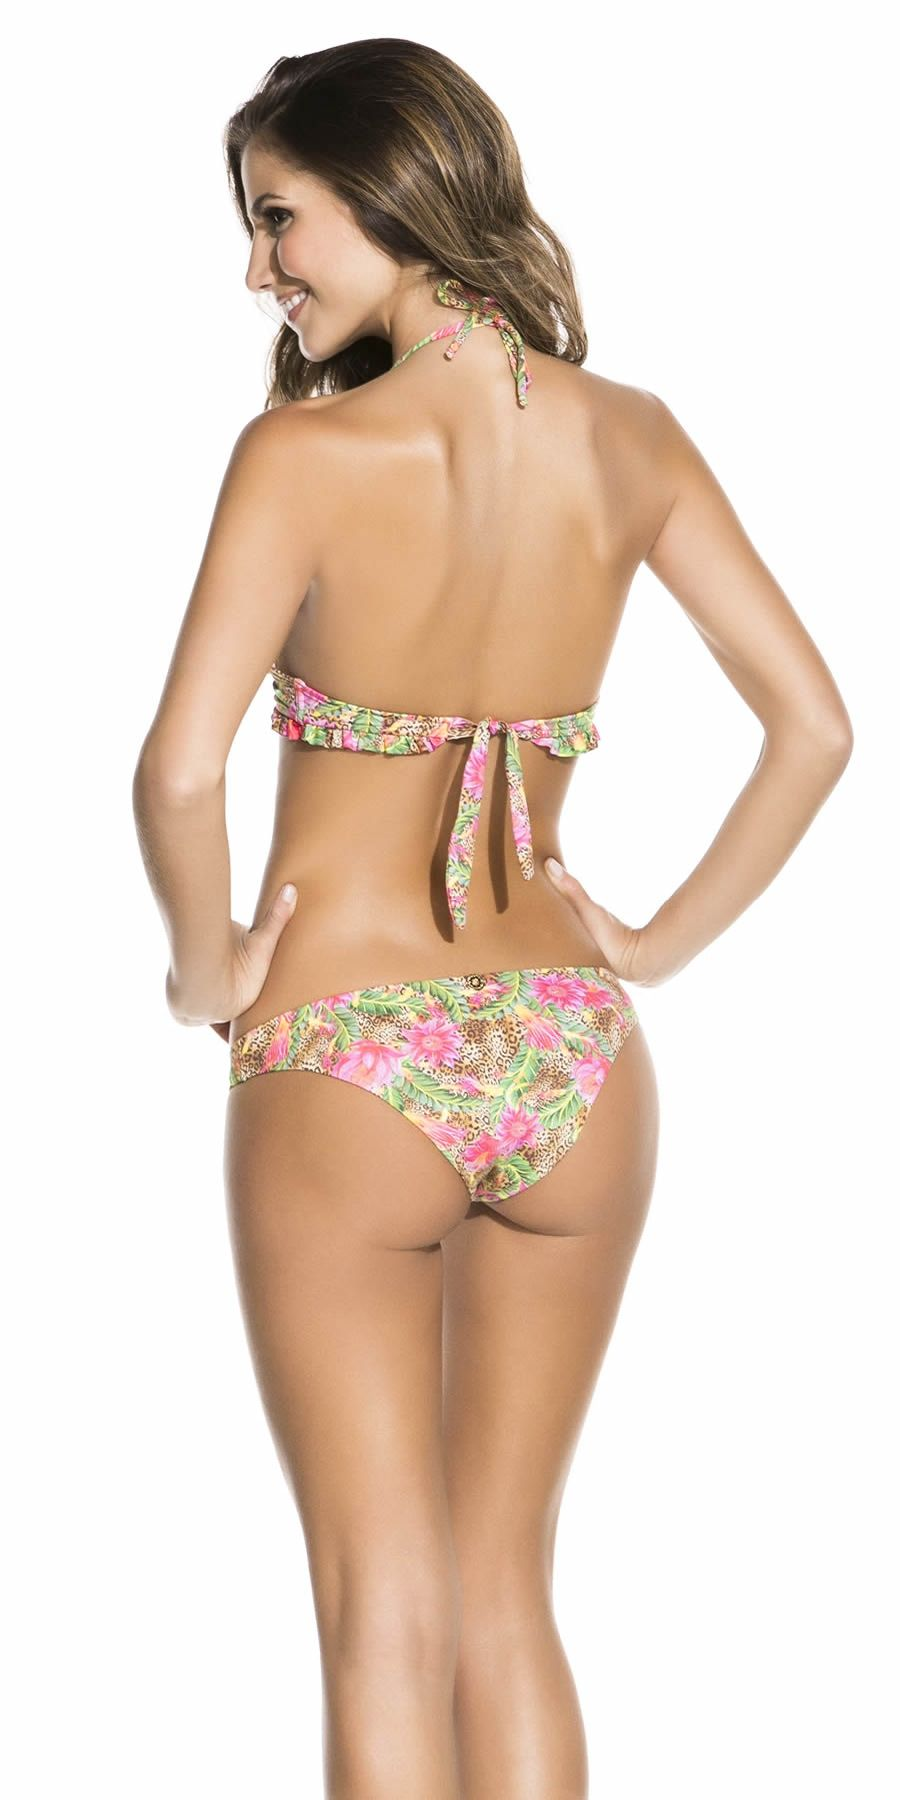 Bikini Daisy Lopez nude (78 photo), Pussy, Is a cute, Feet, bra 2019